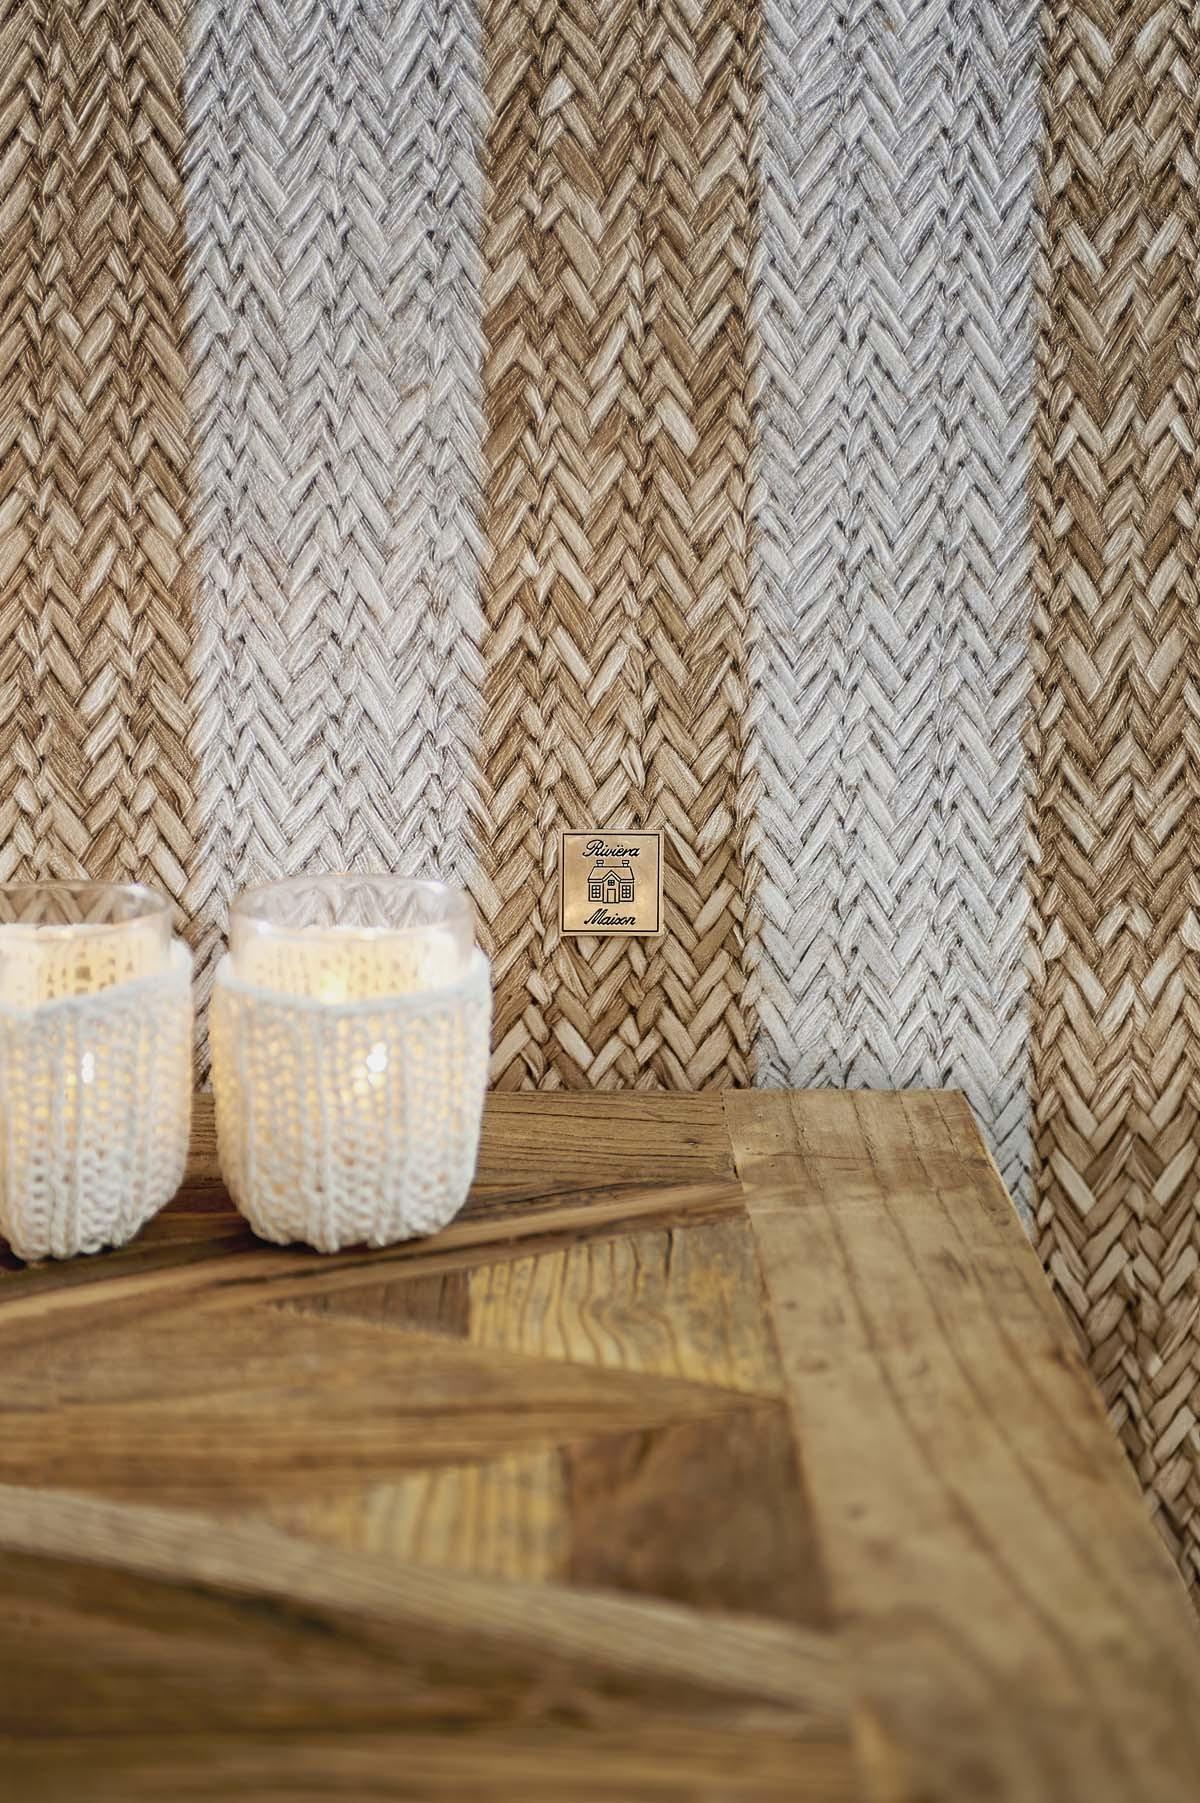 riviera maison bn wallcoverings tapeten gratisversand. Black Bedroom Furniture Sets. Home Design Ideas